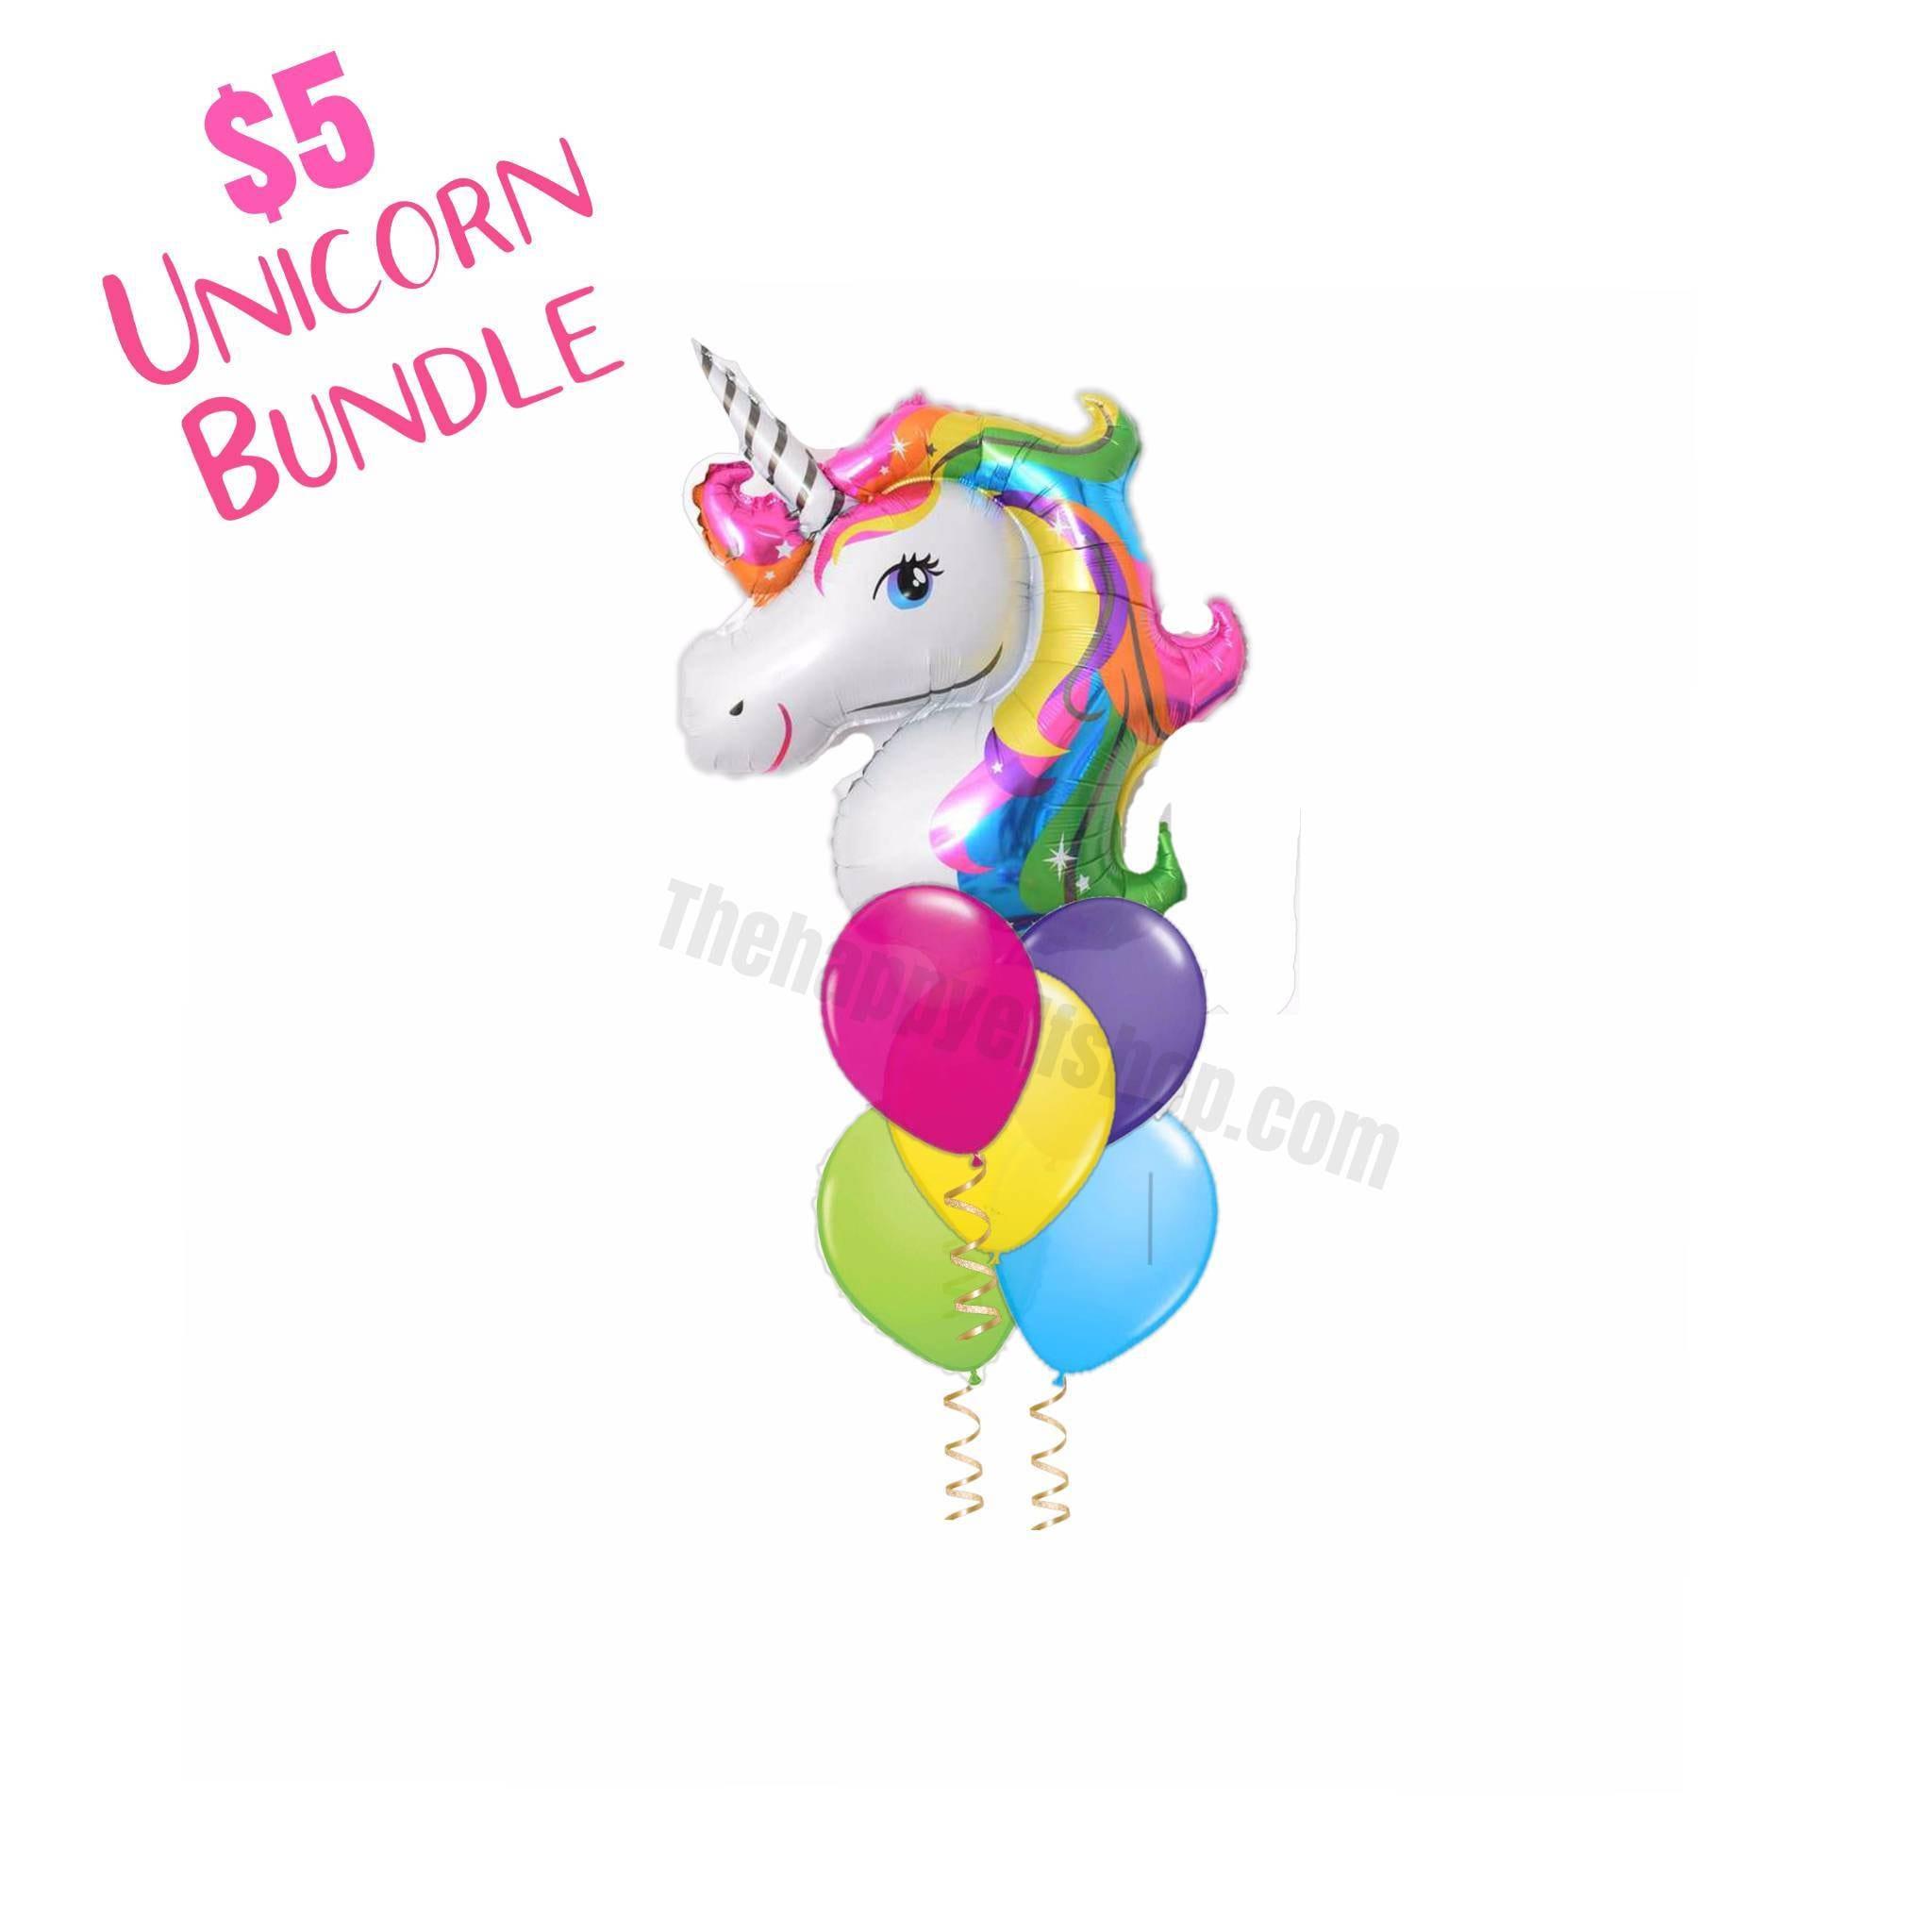 33 Unicorn balloon  unicorn party decor  unicorn party